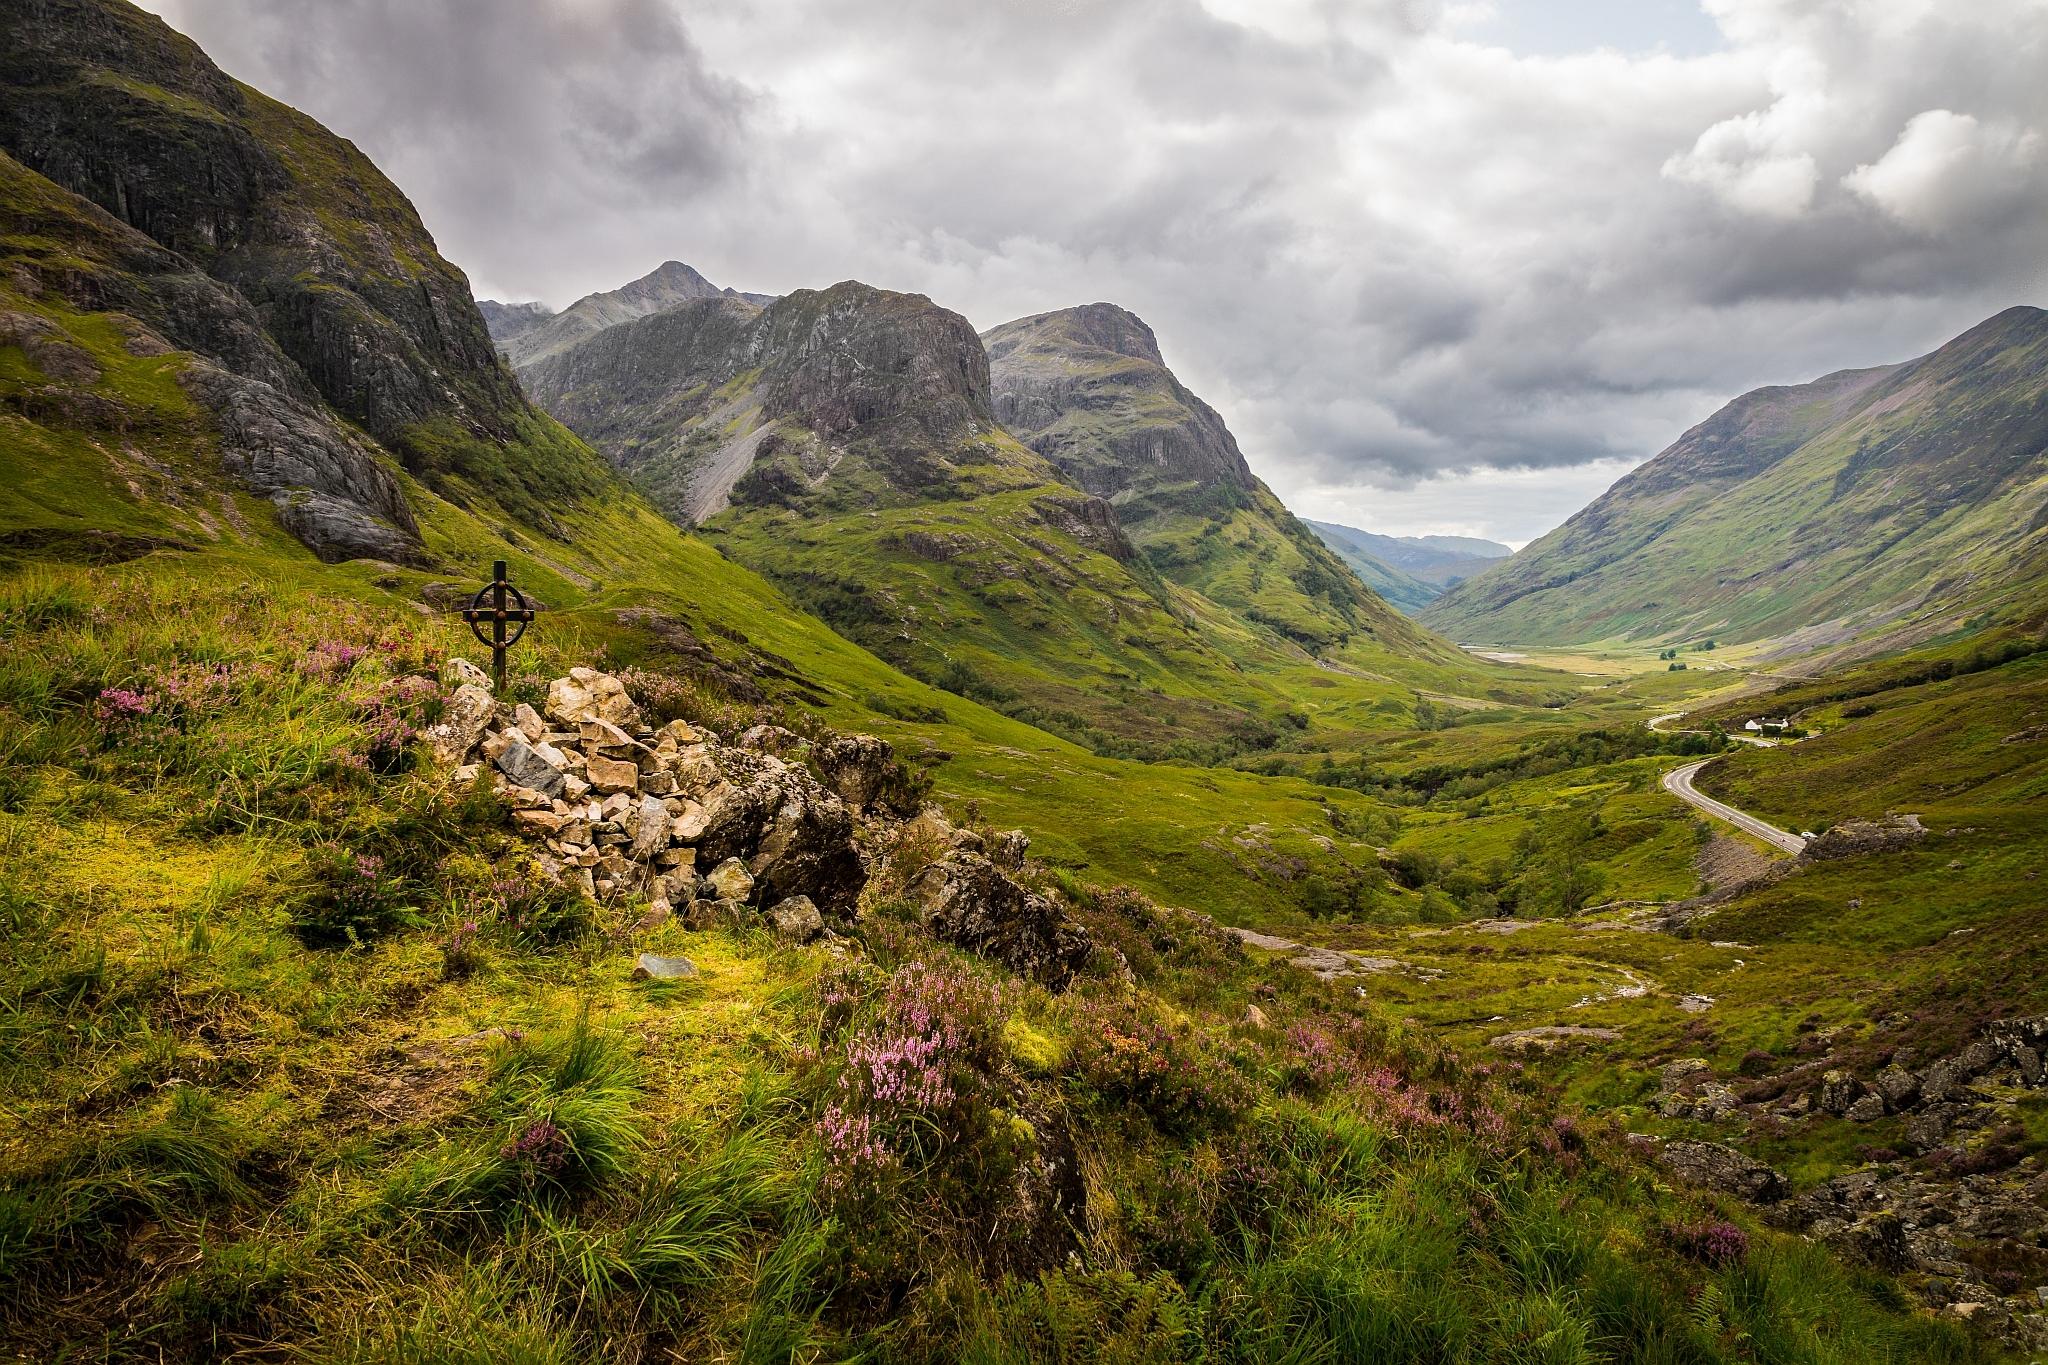 Glen Coe Scotland, United Kingdom